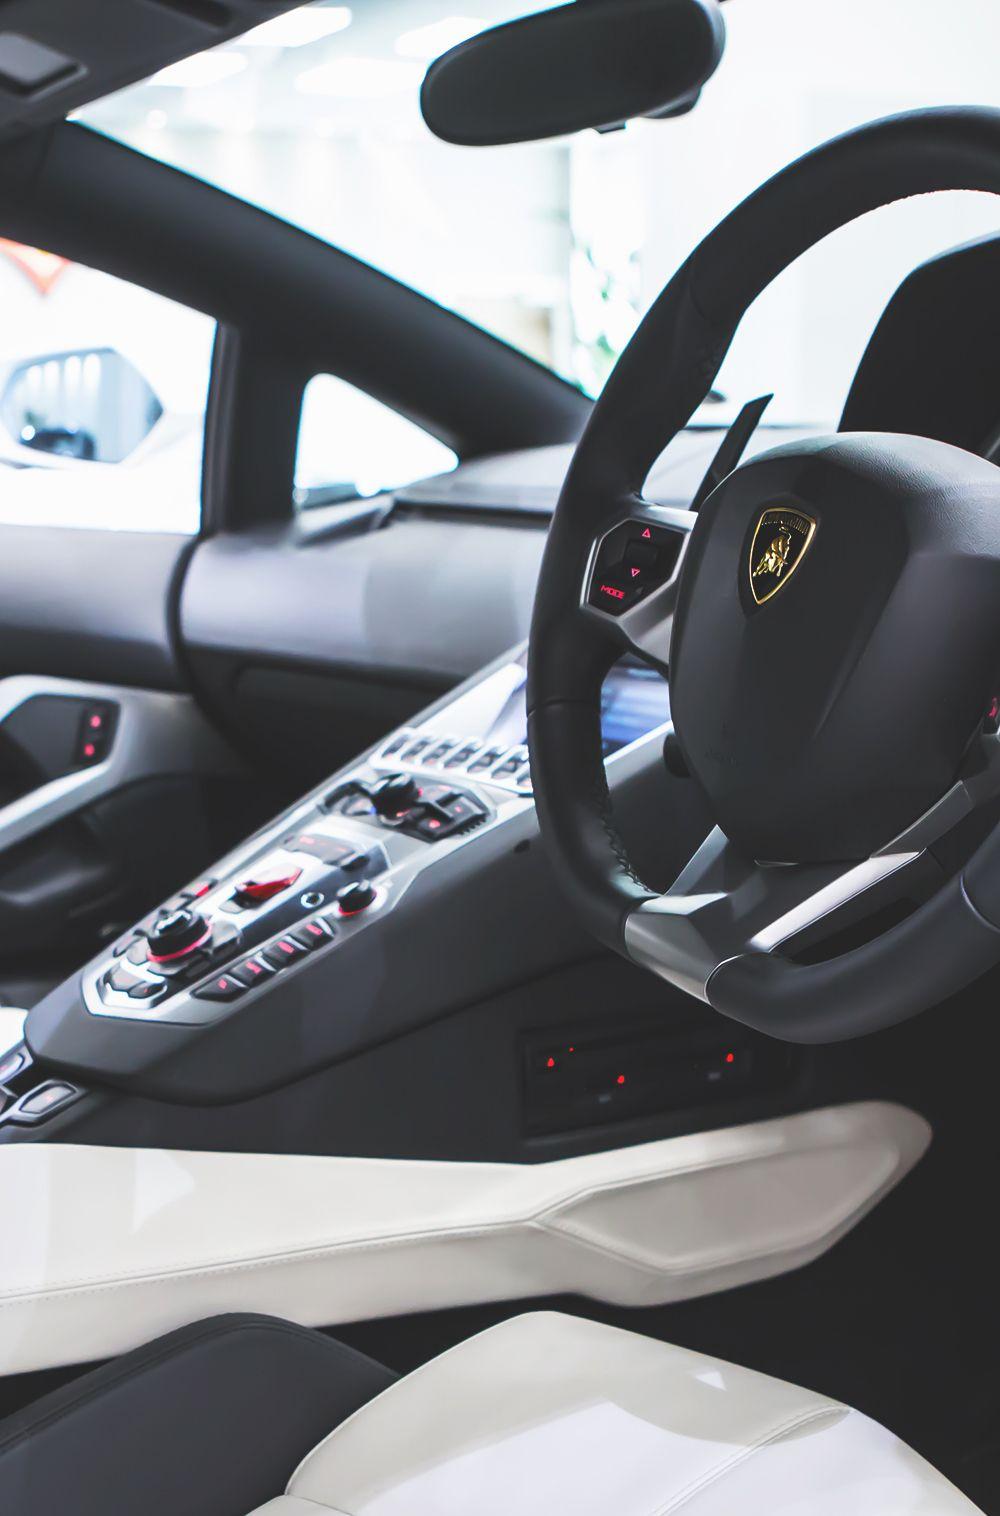 Cars, Luxury car interior, Sports cars